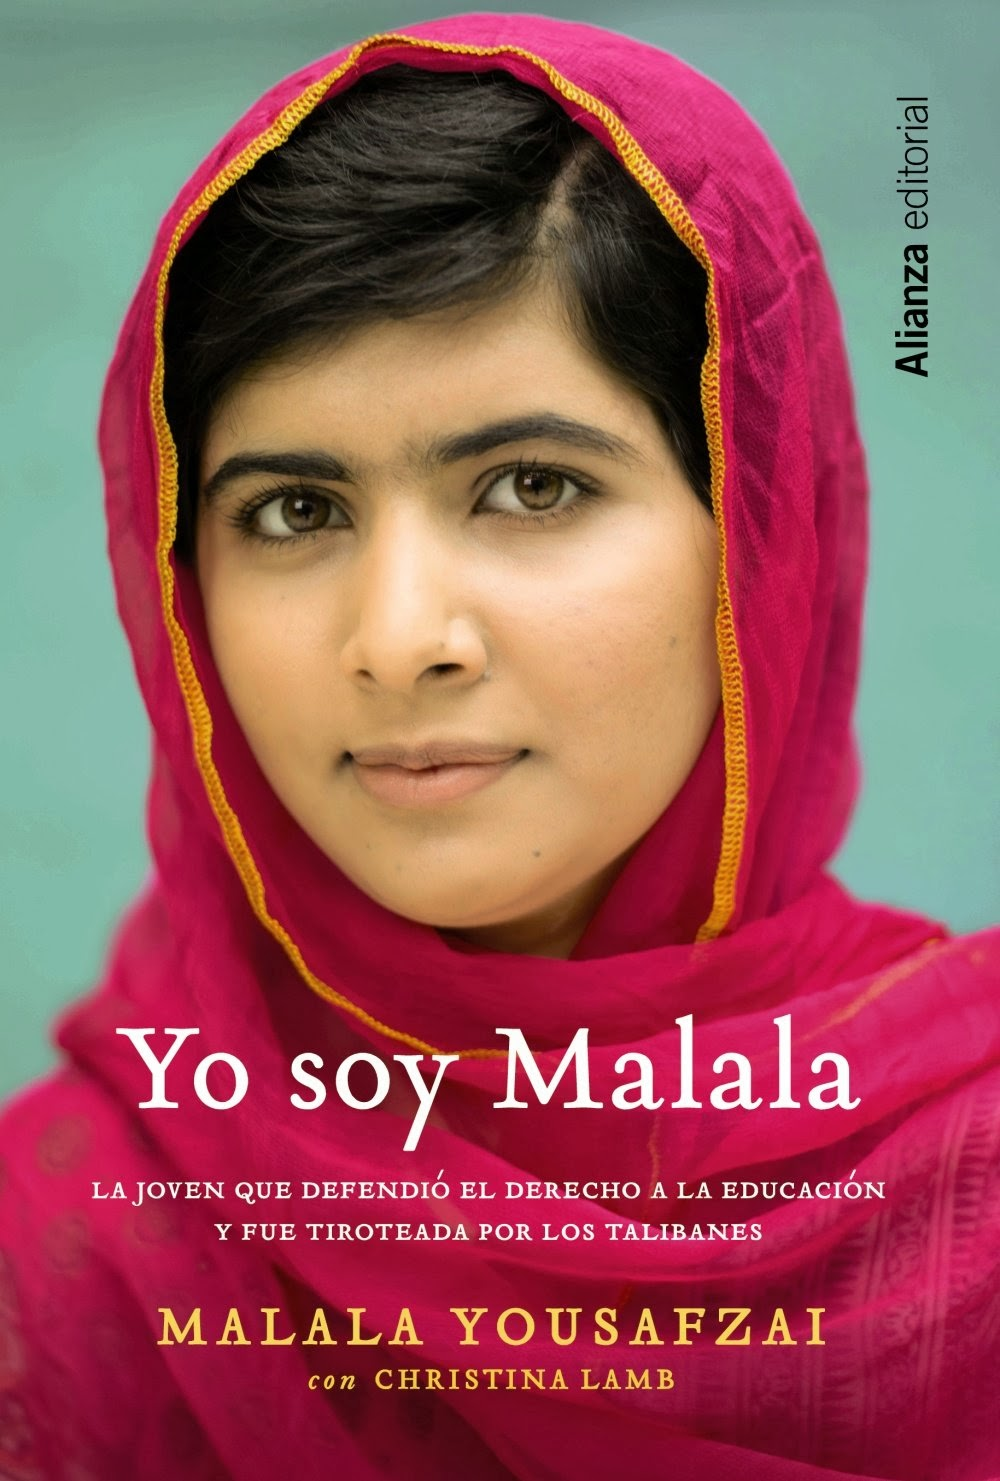 YO SOY MALALA, de Malala Yousafzai y Christina Lamb